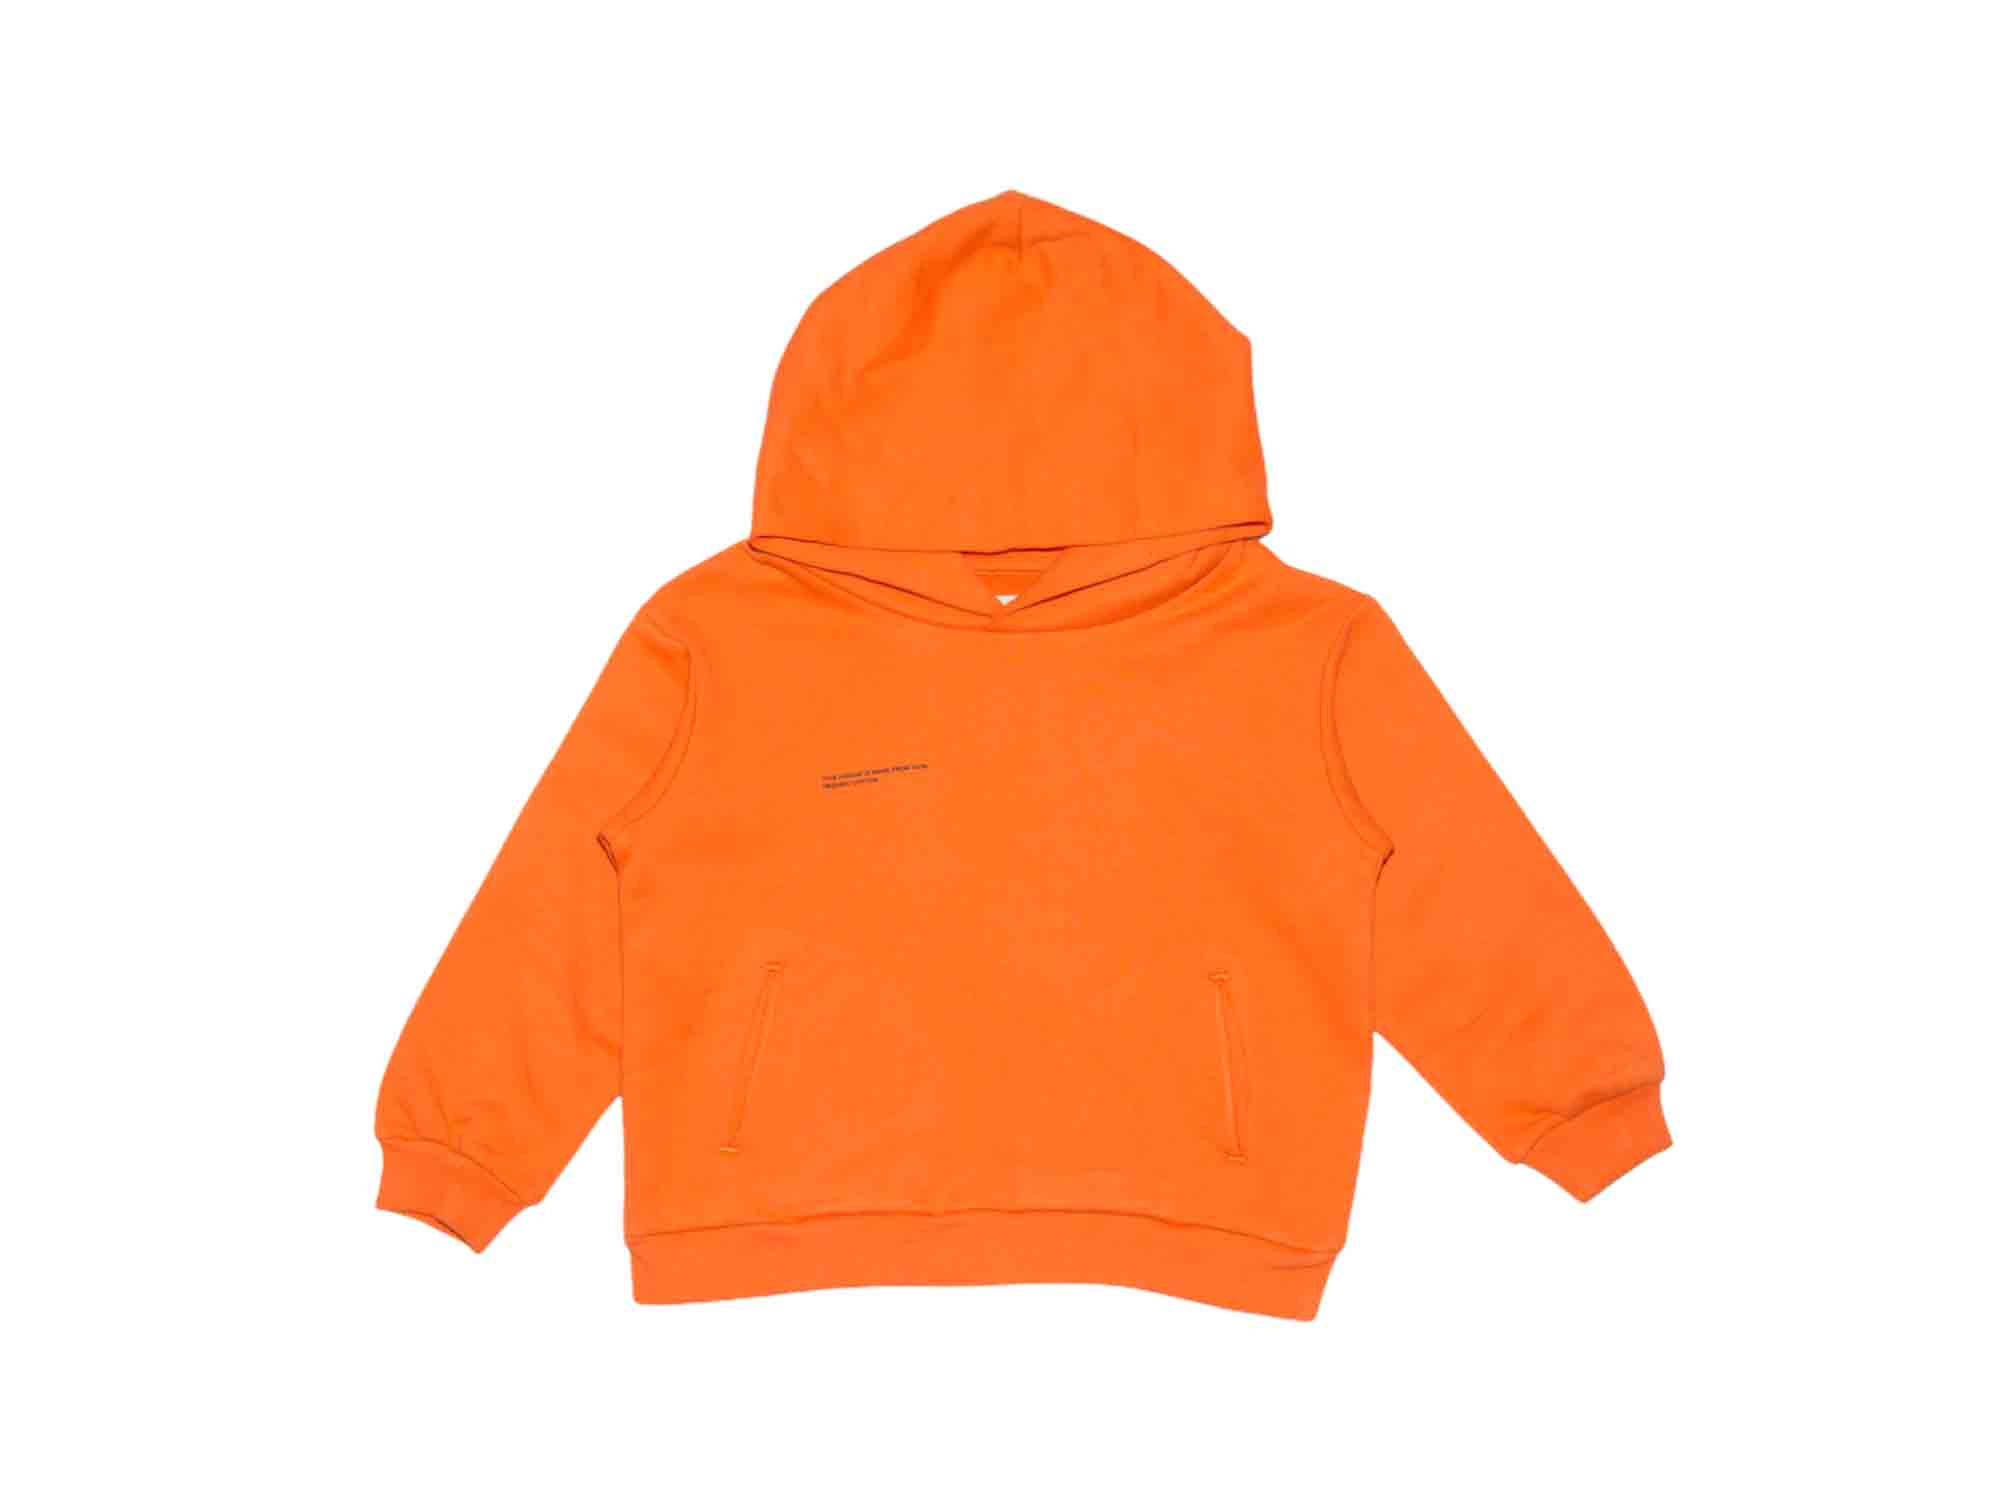 slide 1 - Persimmon Orange Organic Cotton Hoodie